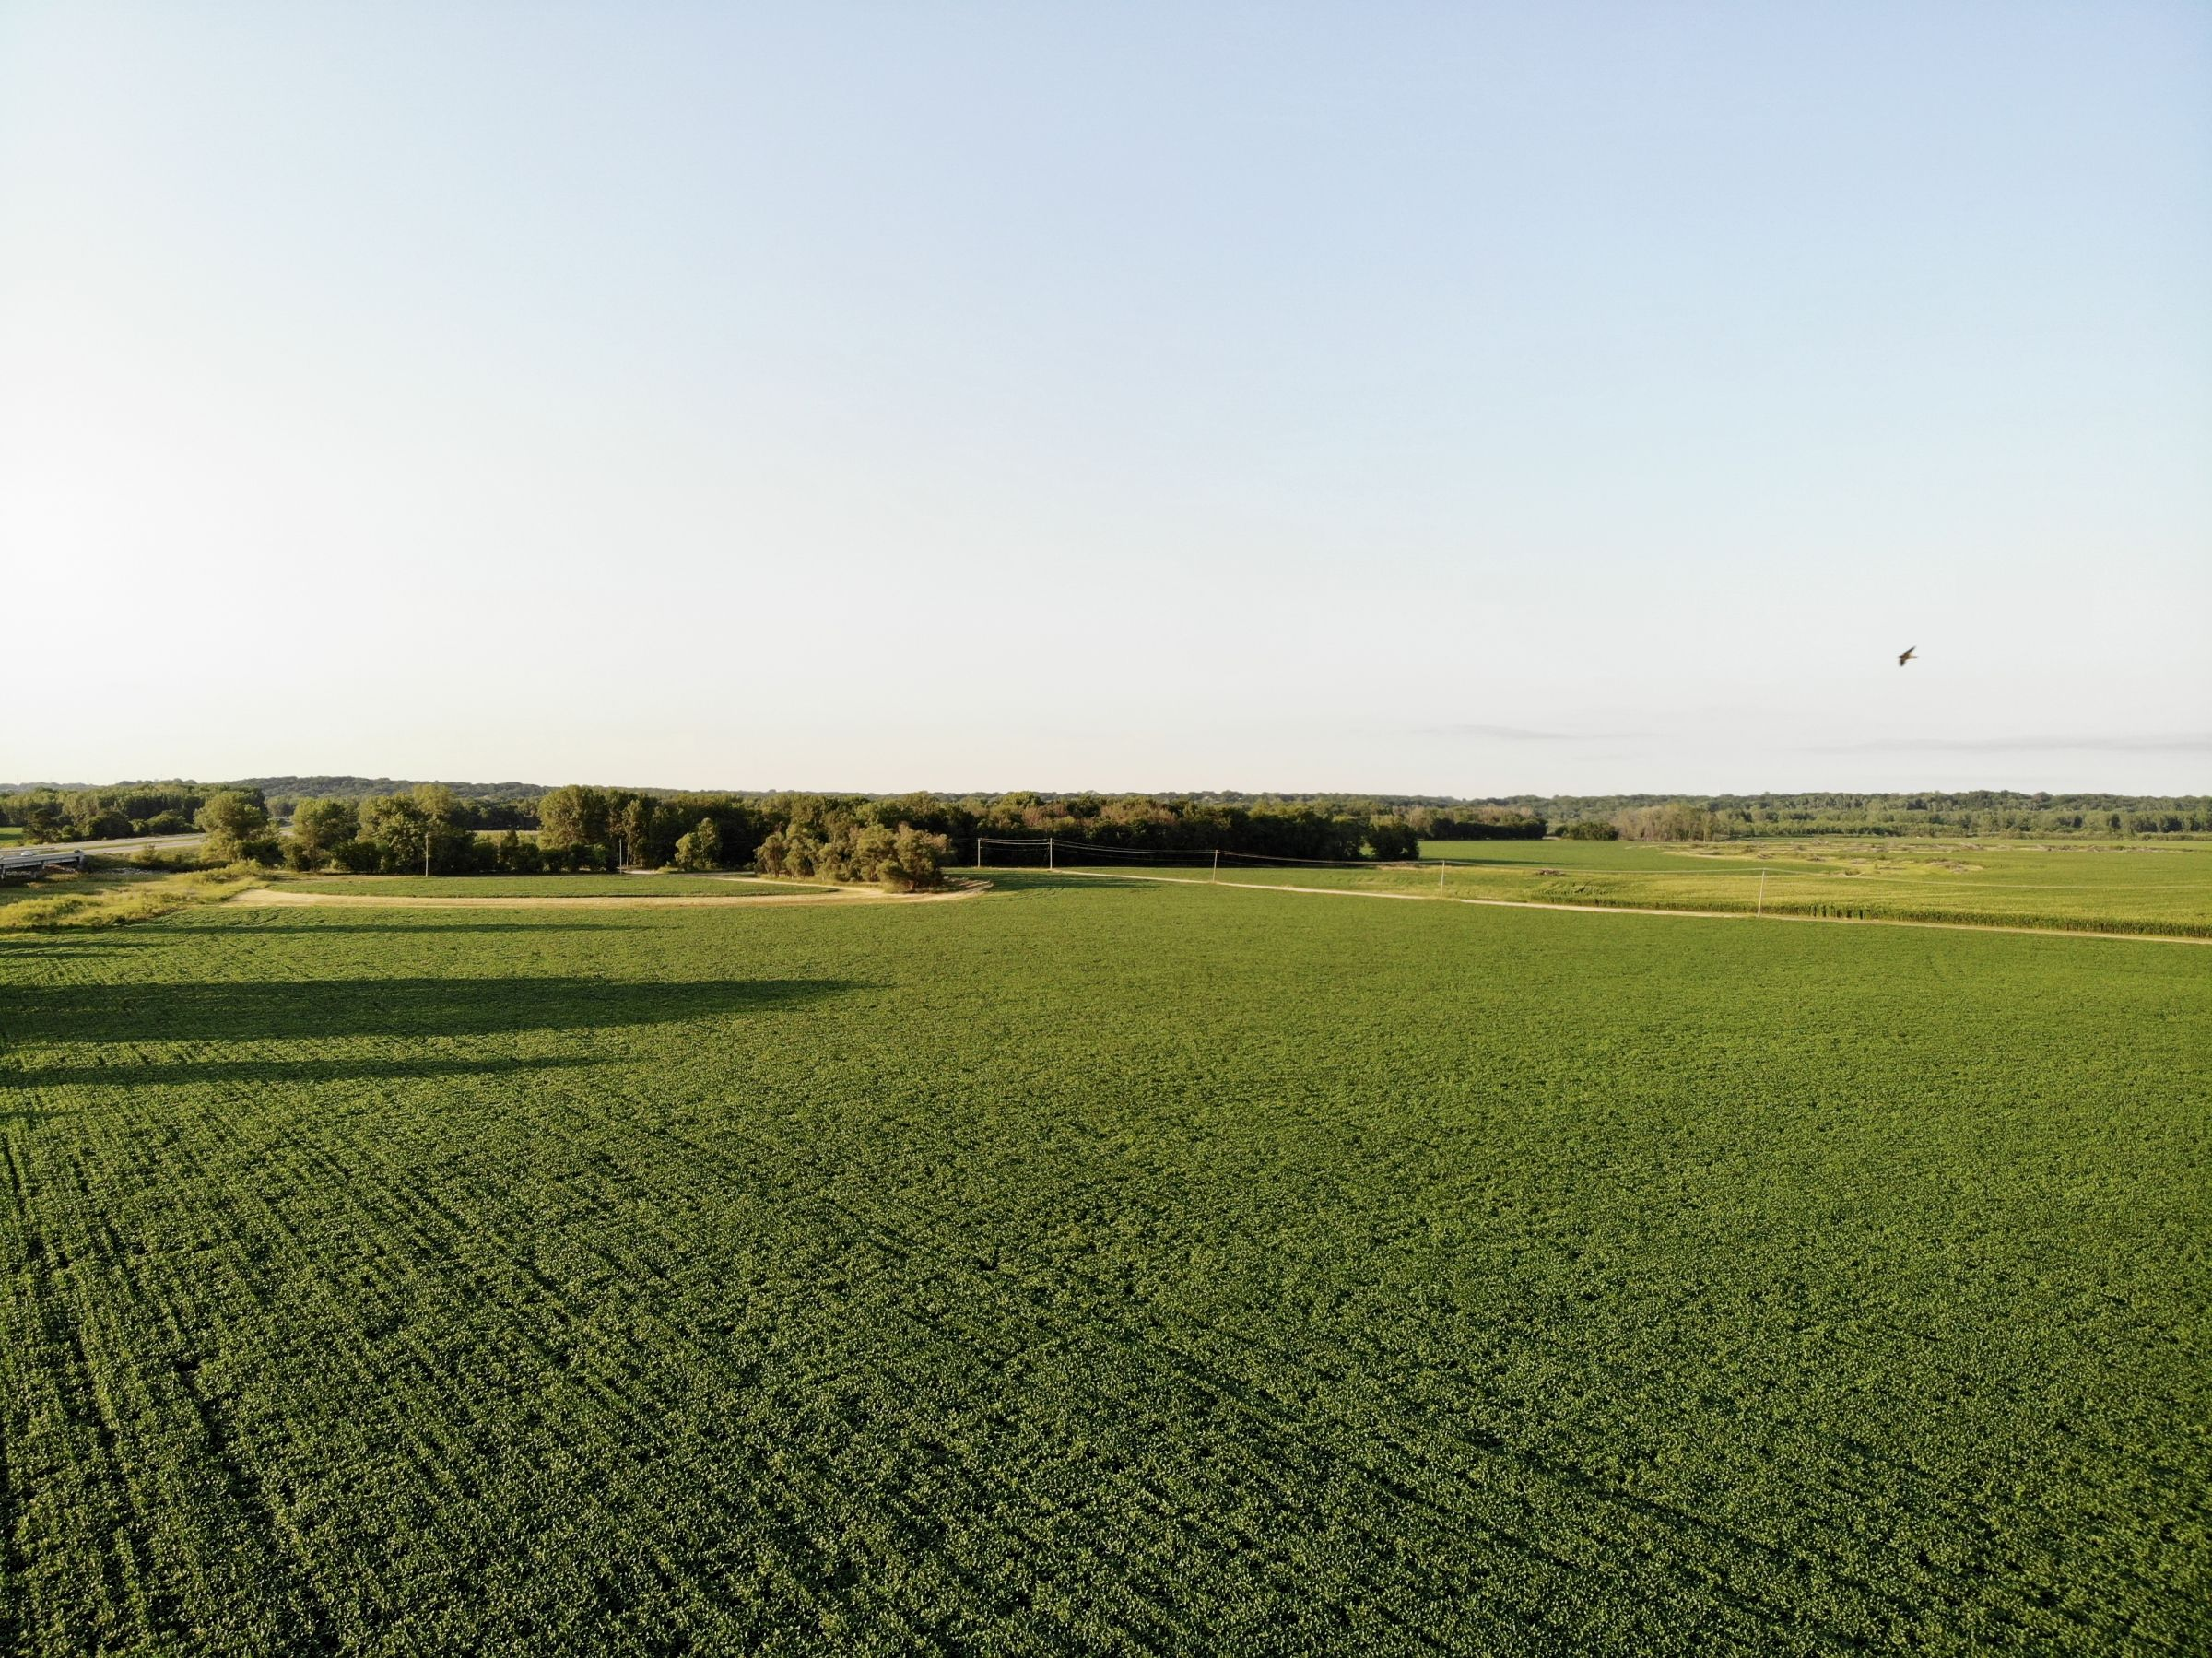 land-polk-county-iowa-89-acres-listing-number-15626-3-2021-07-09-142611.jpg